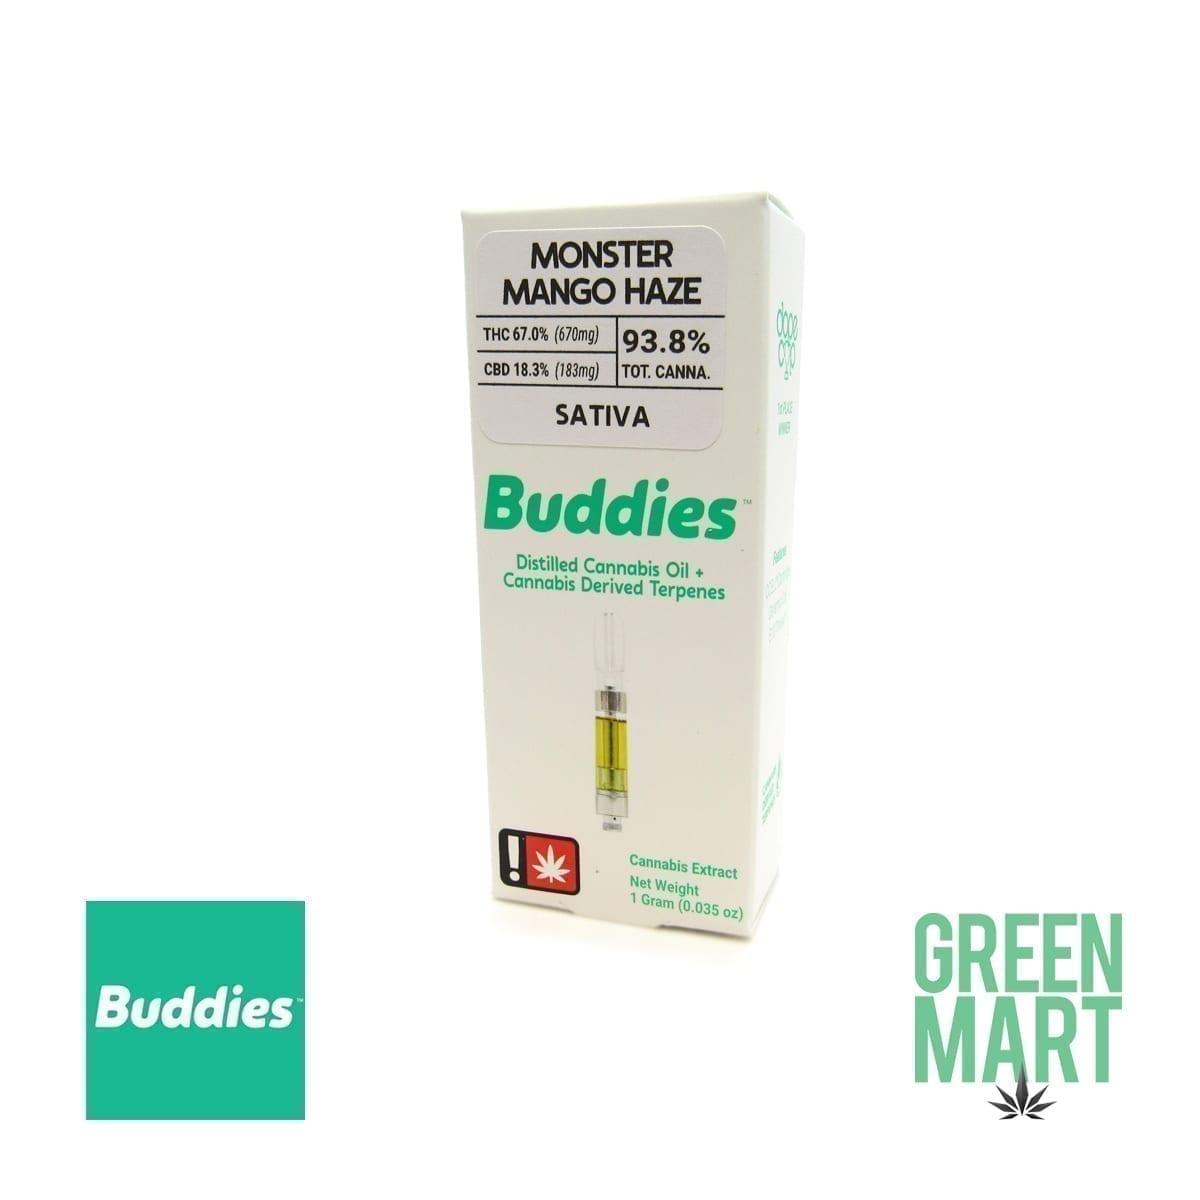 Buddies Brand Distillate Cartridge - *CBD* Monster Mango Haze